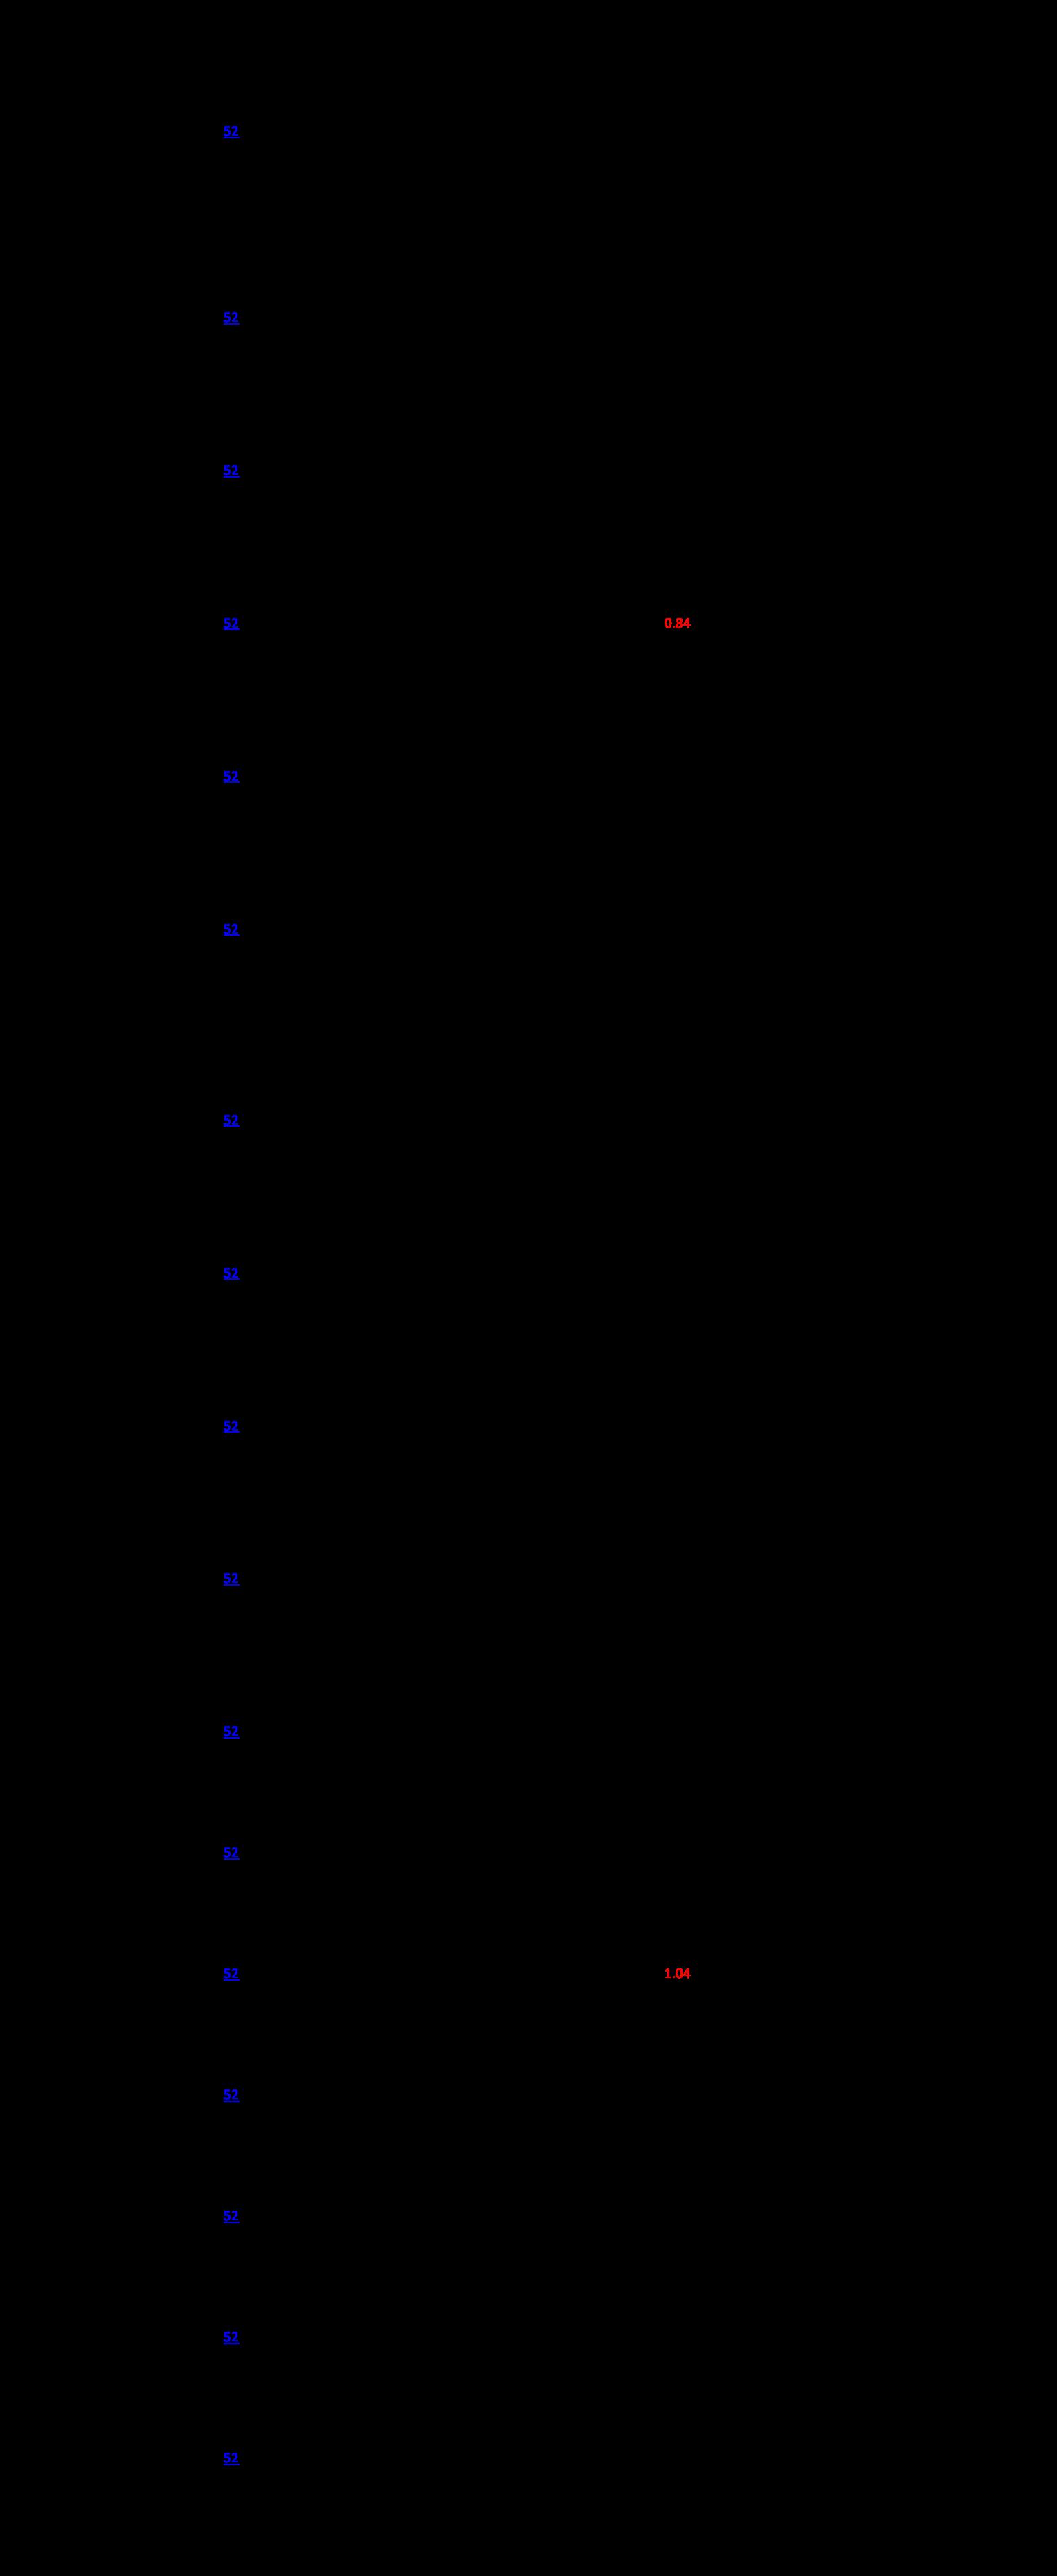 Horse_biochem_measurands.png